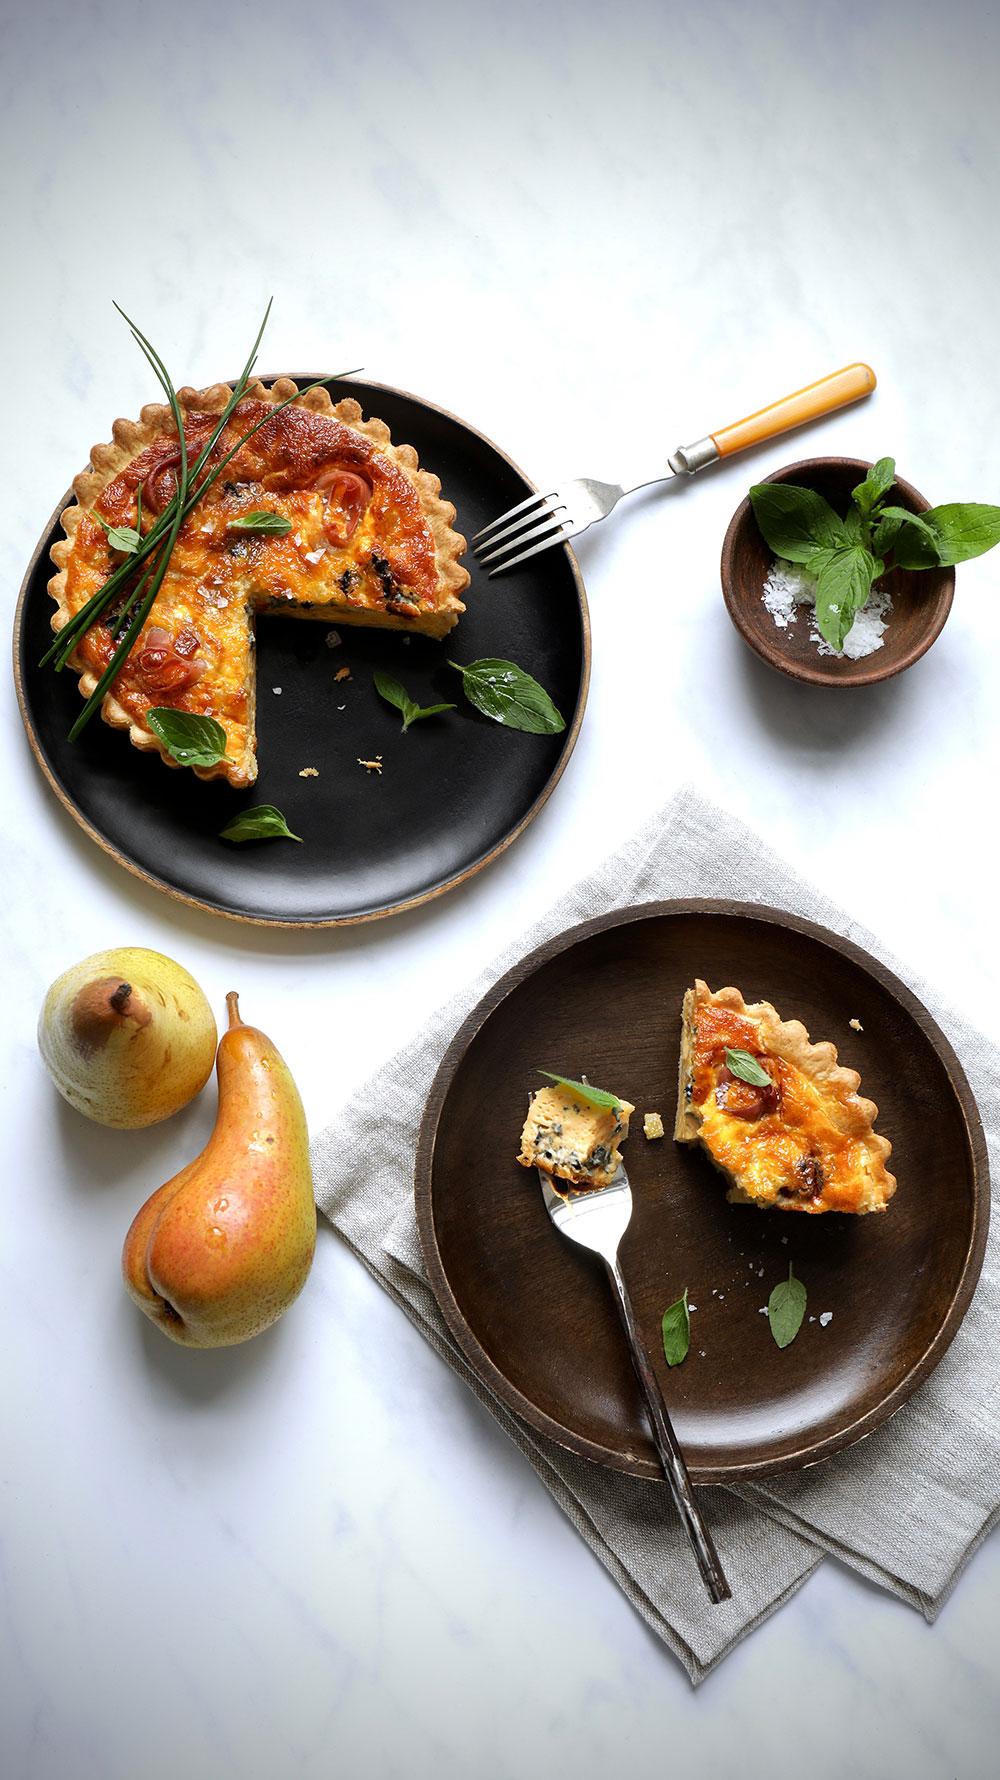 Milly-DL-Cookbook-Pear-gorgonzola-prosciutto-tart